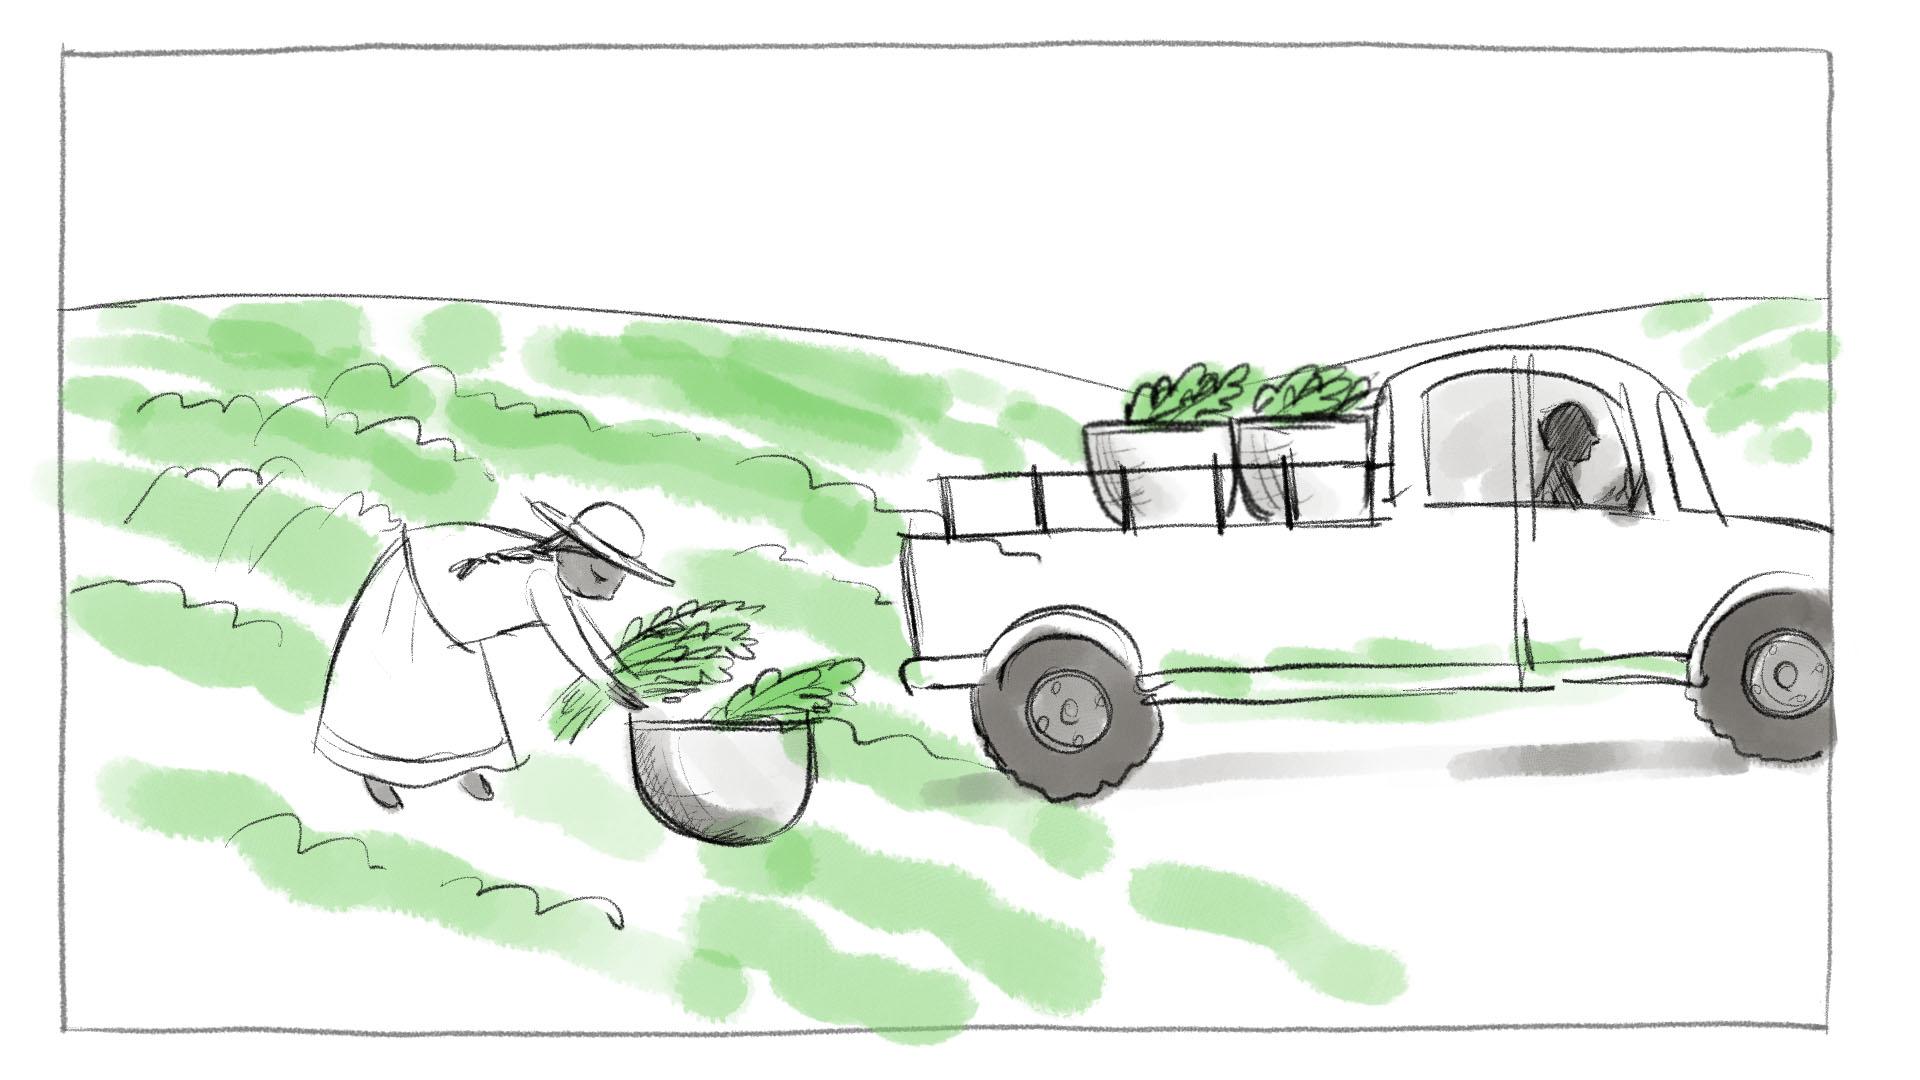 Shahidi_Storyboards_3a-1.jpg